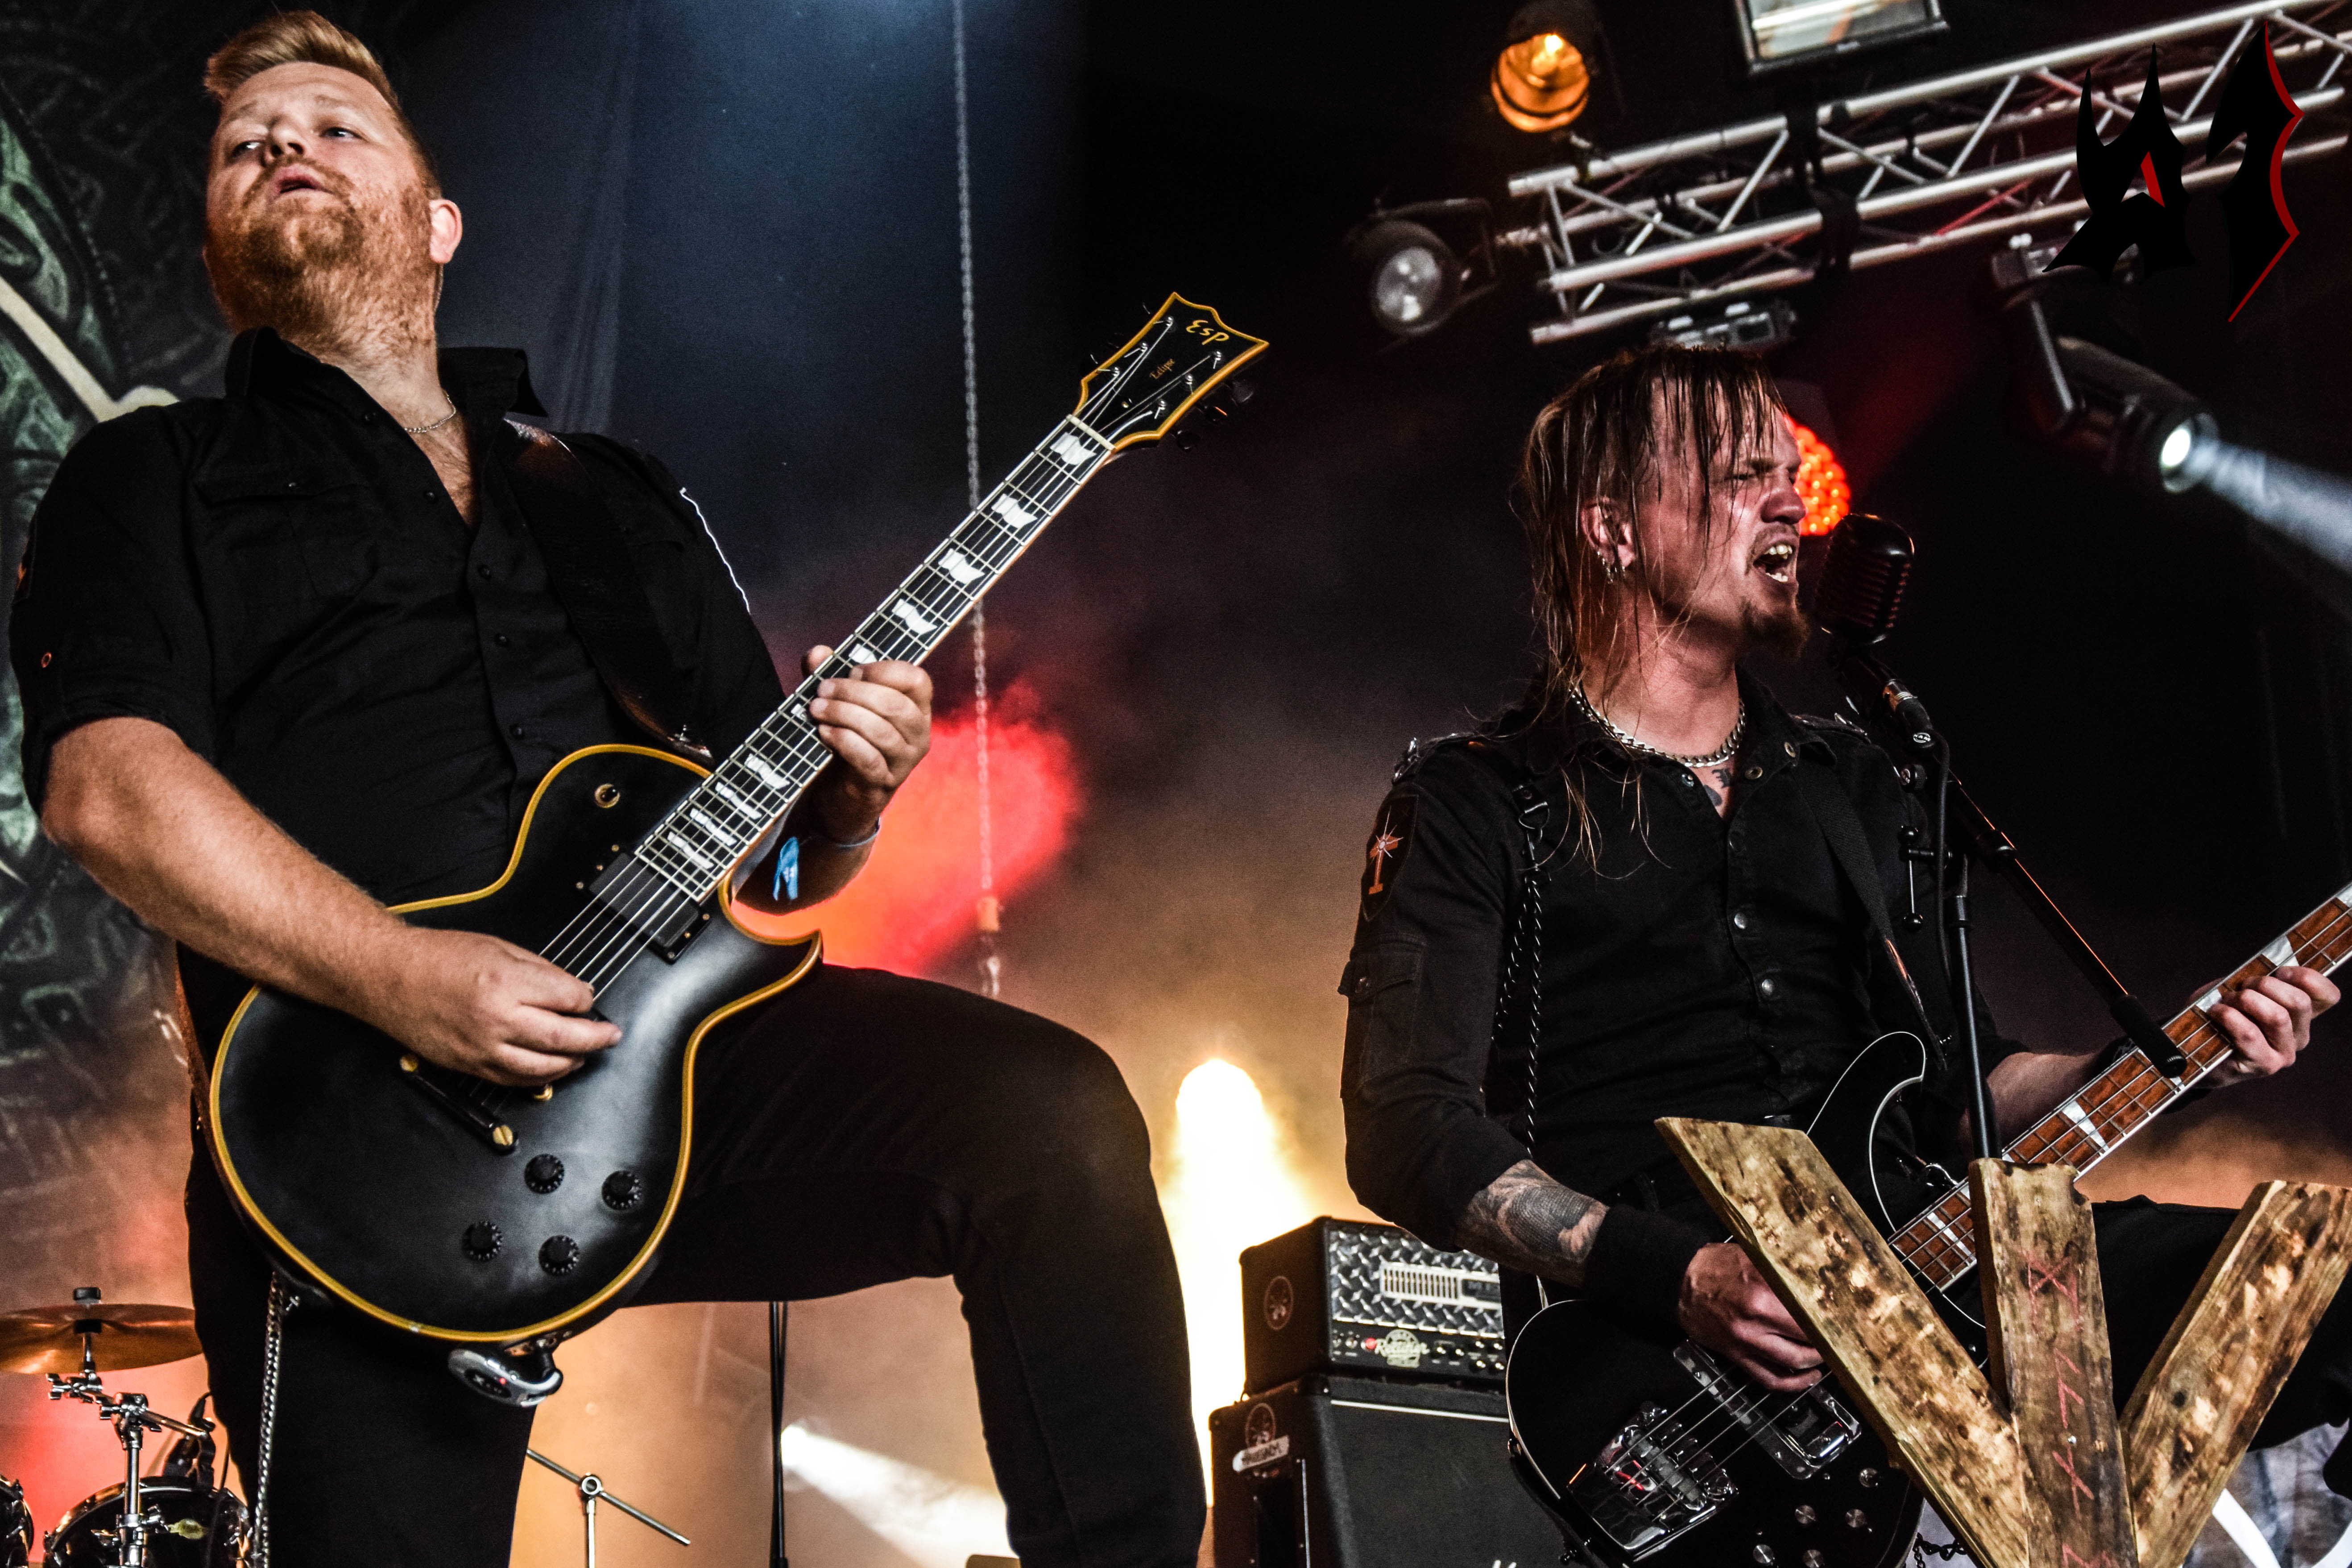 Hellfest 2018 – Day 3 - Manegarm 20